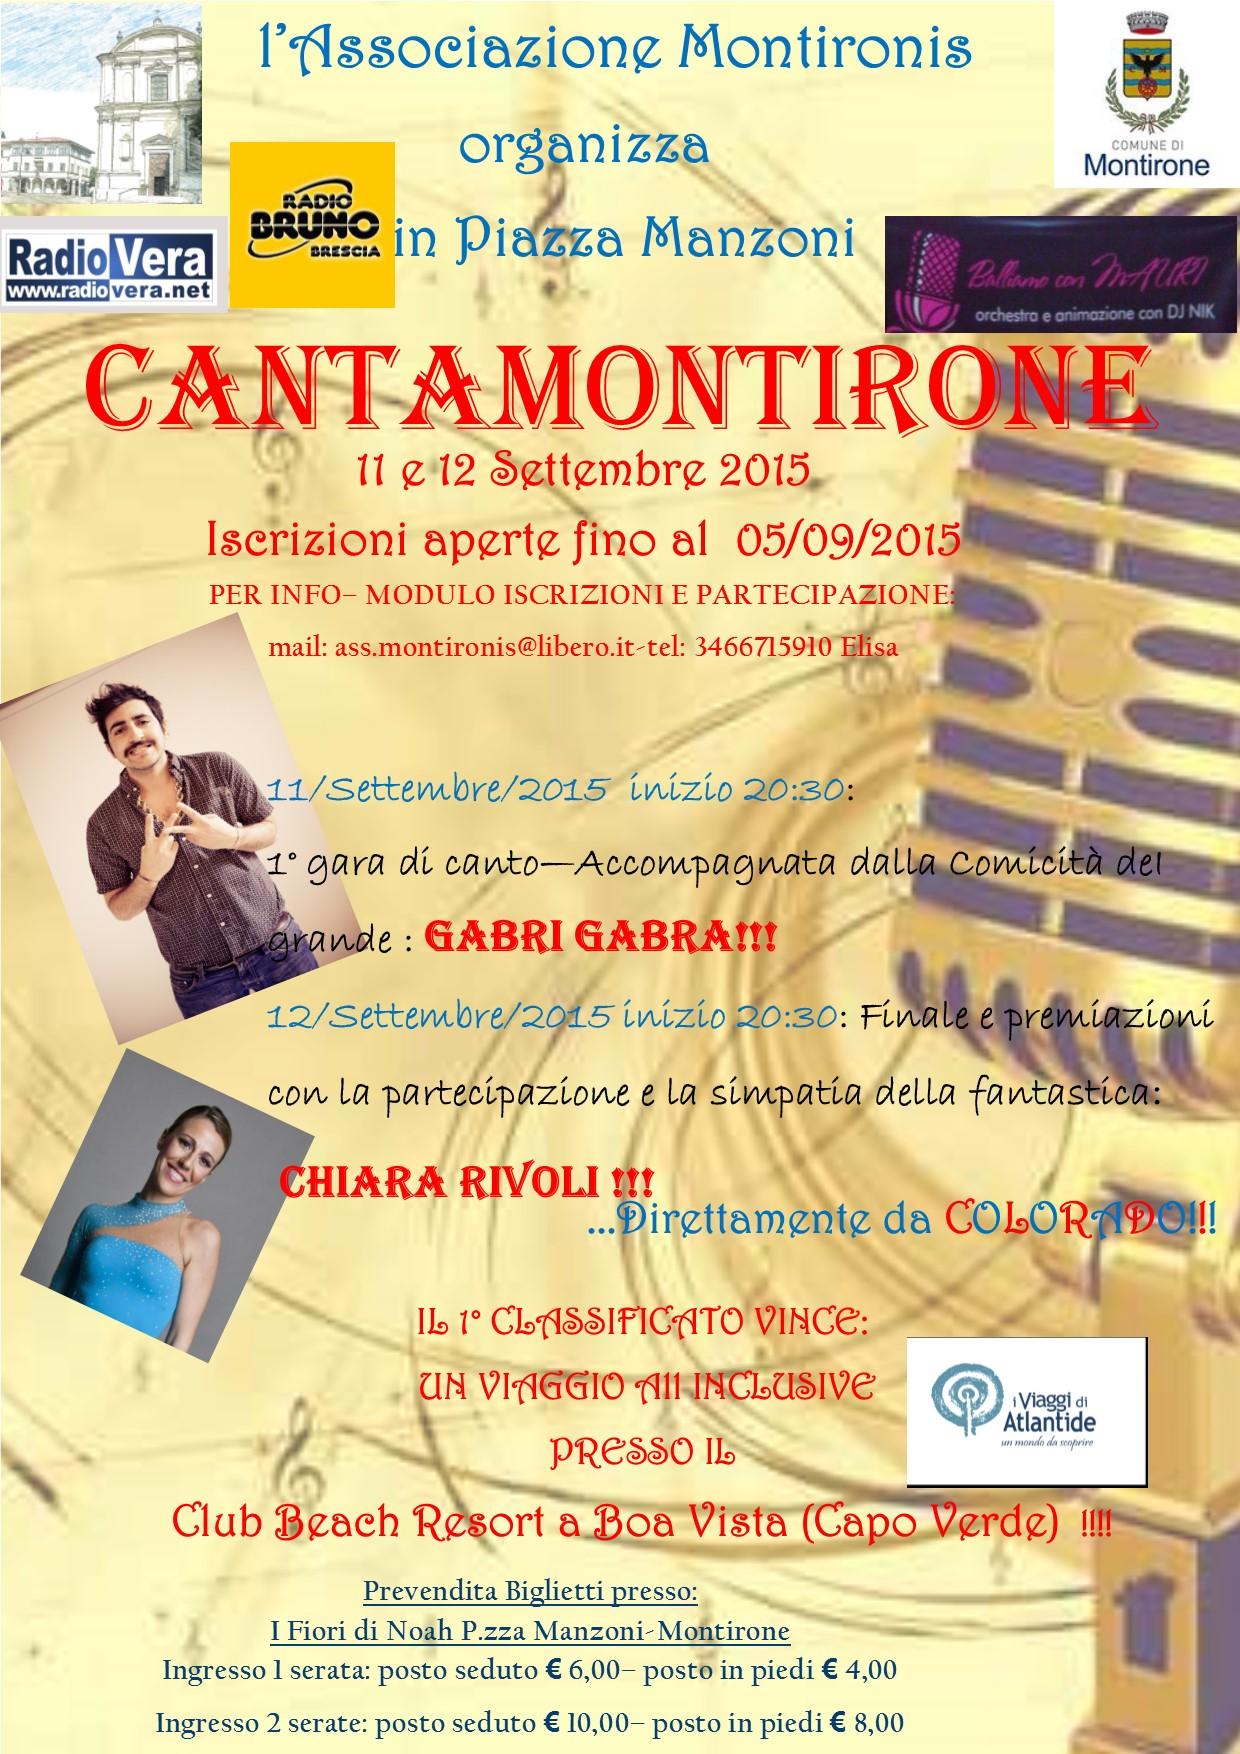 http://associazionemontironis.jimdo.com/eventi/canta-montirone/